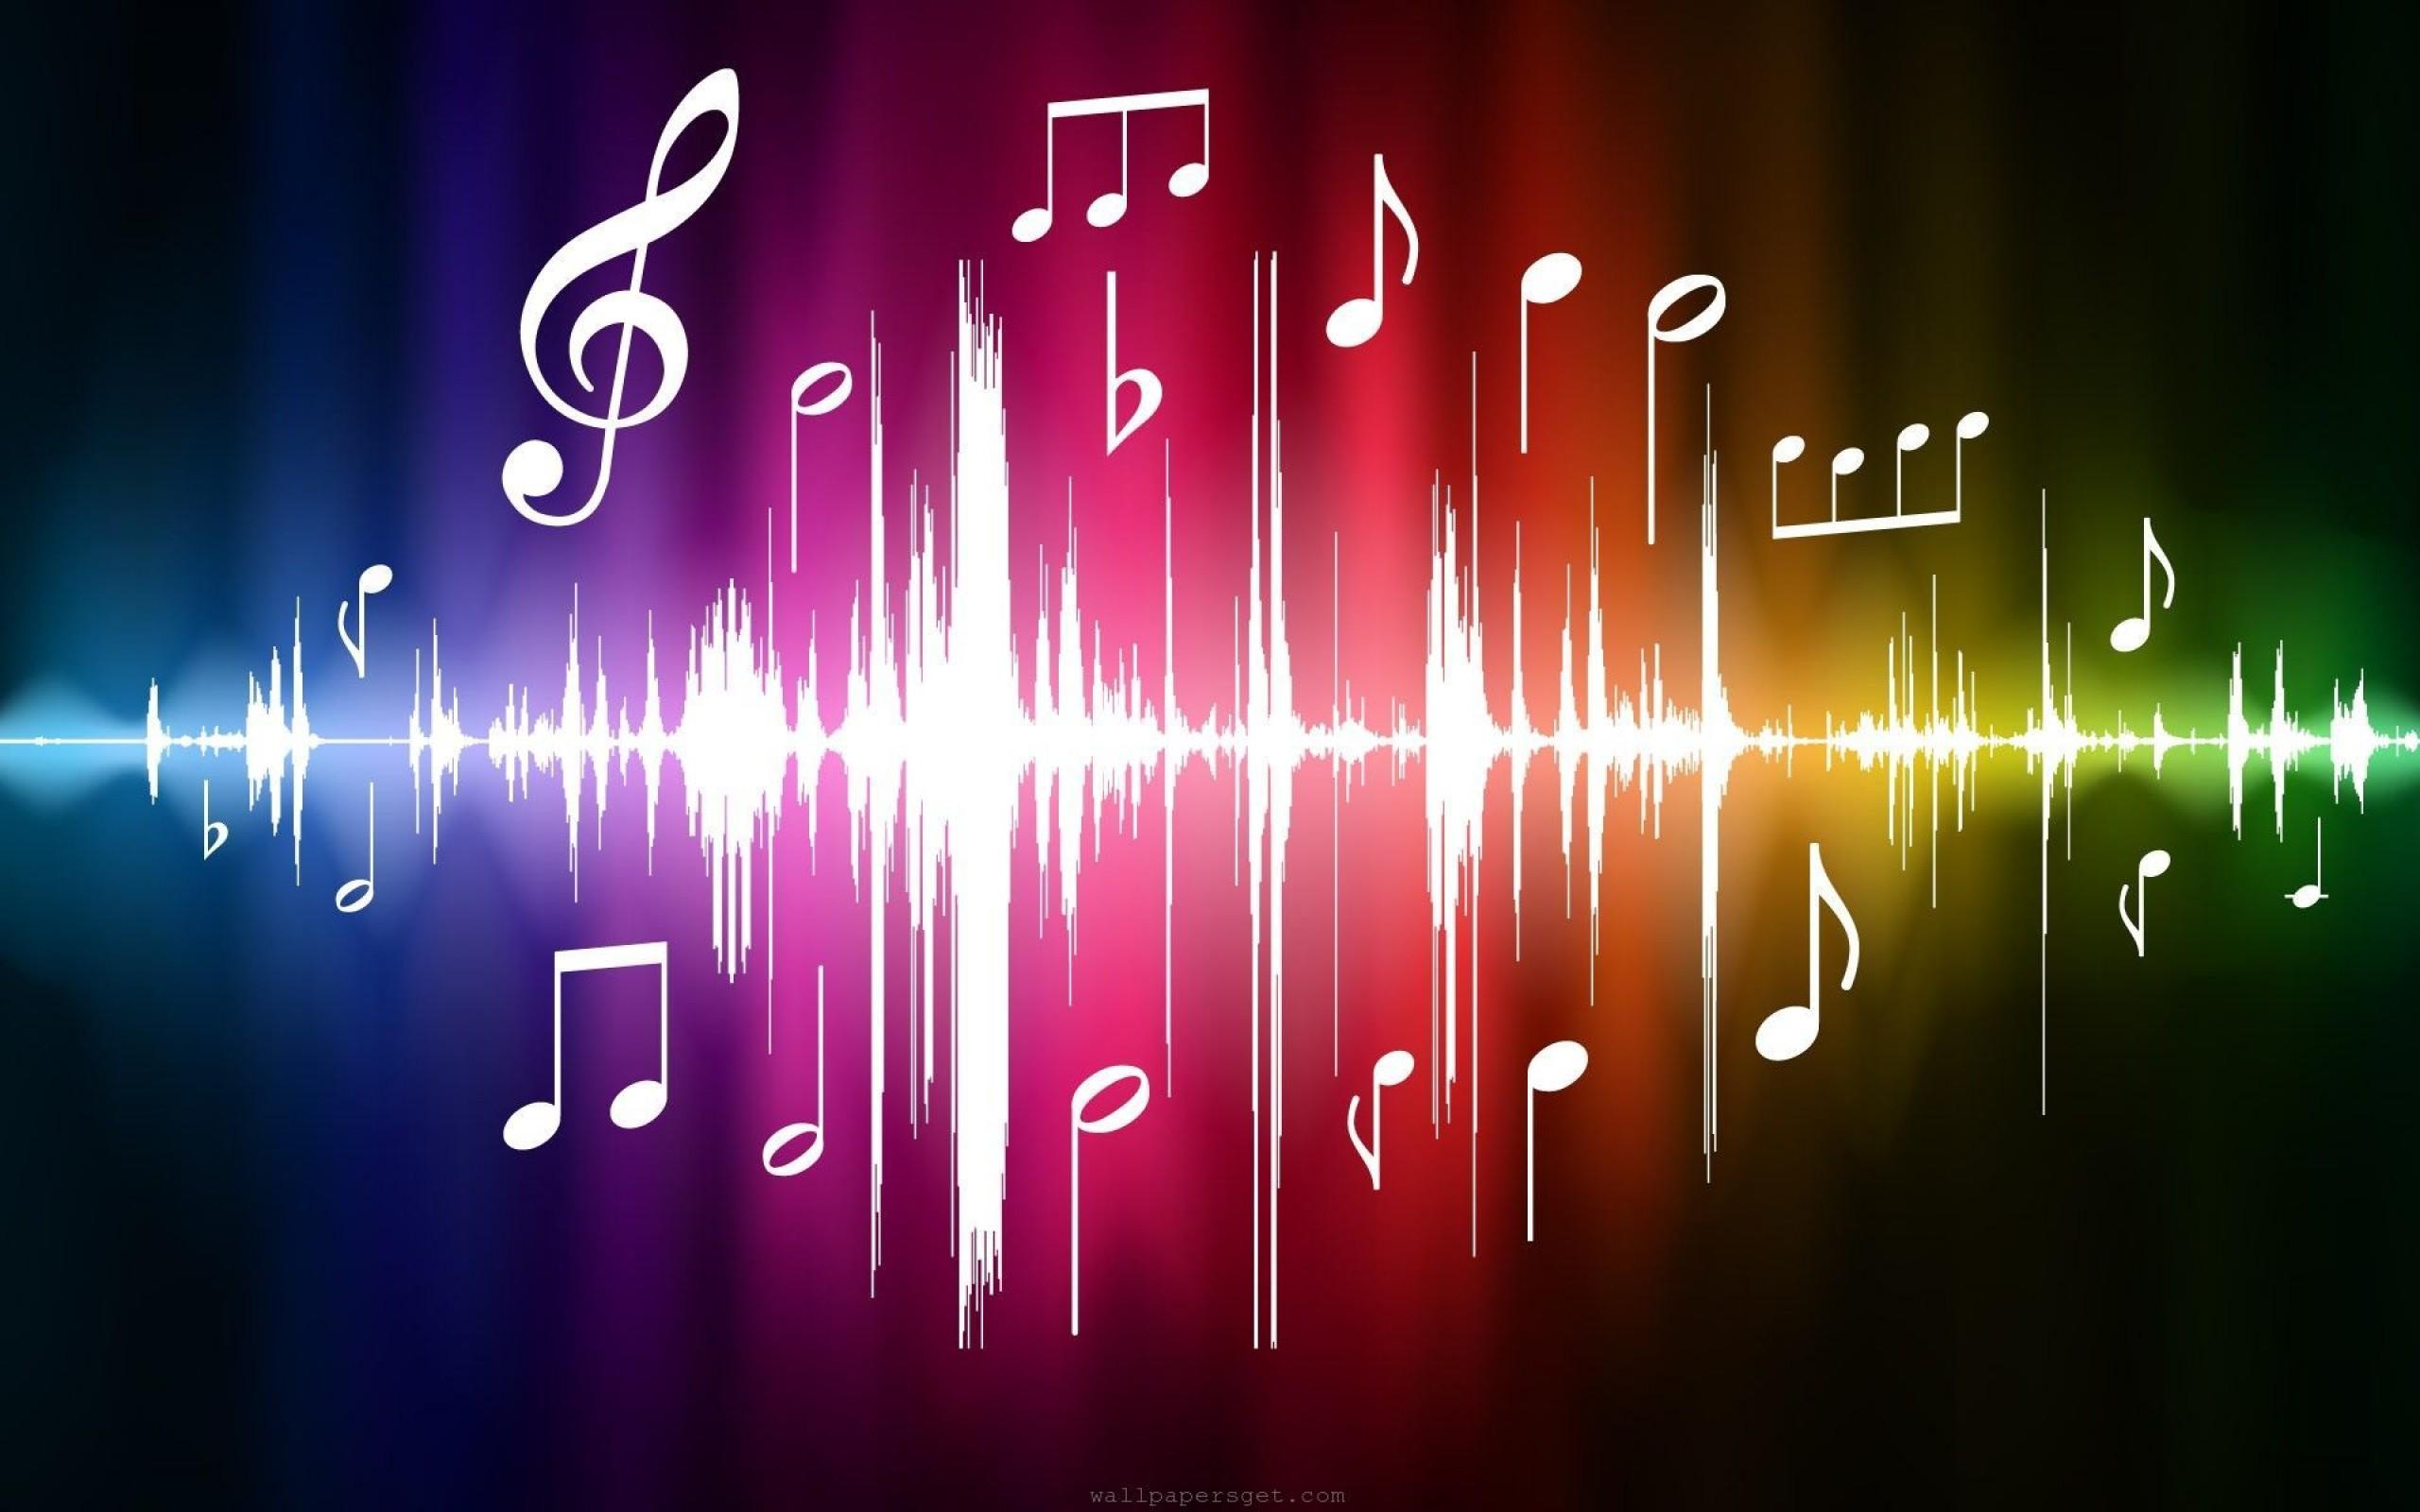 in hd wallpapers sound waves musical note desktop 25601600 wallpaper 2560x1600